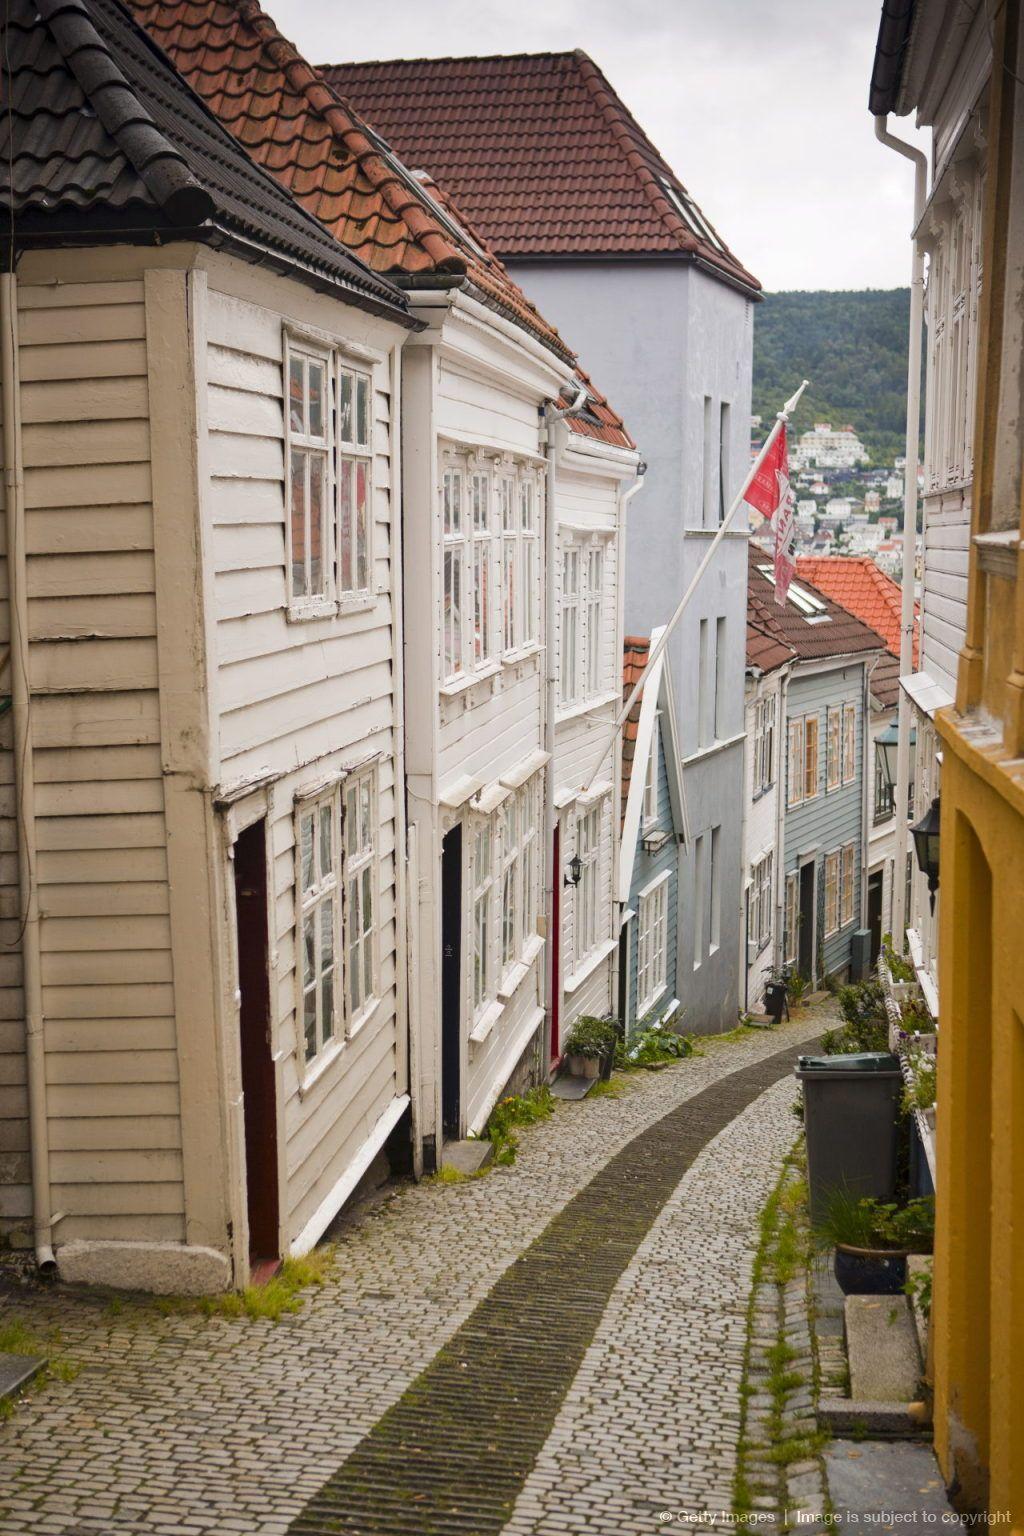 Image detail for -Knosesmauet street, Stransidden district, Bergen, Hordaland, Norway, Scandinavia, Europe